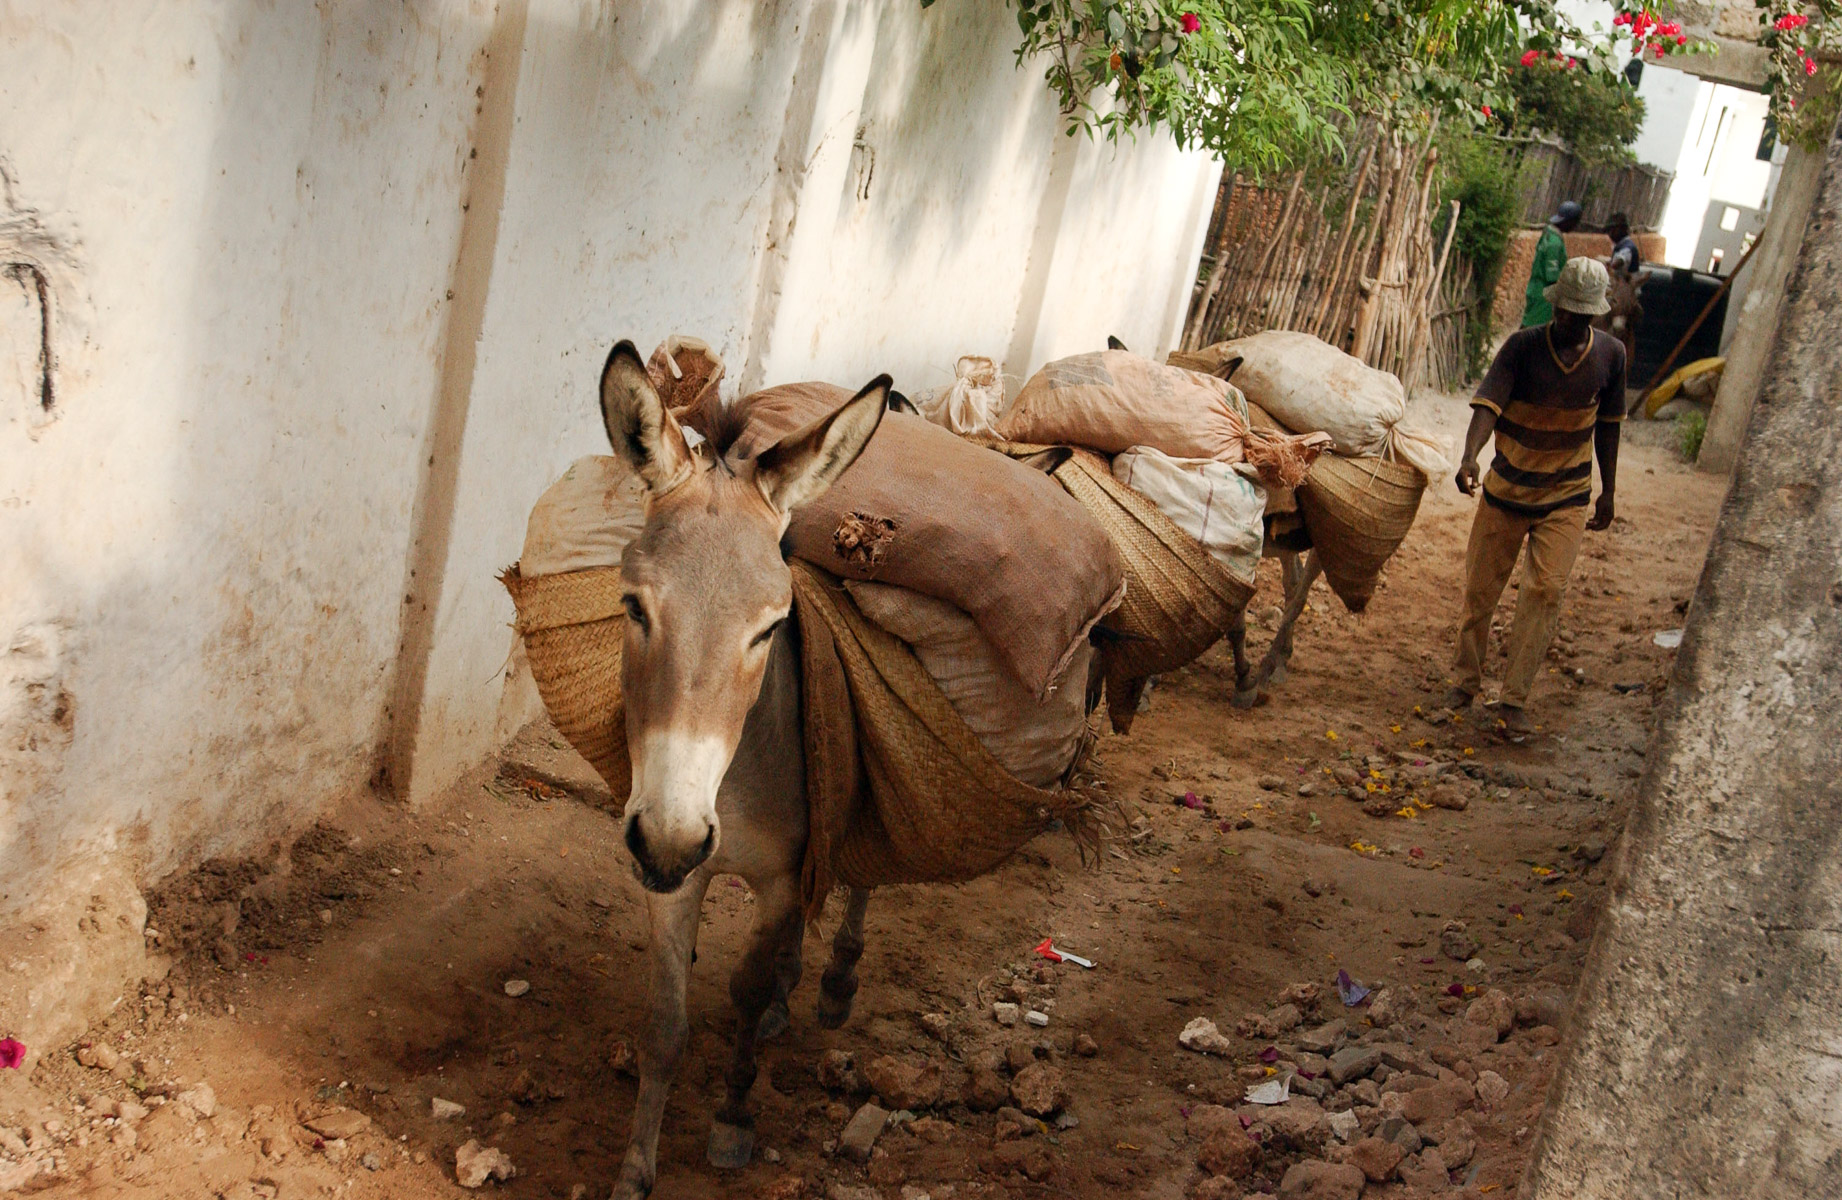 Donkeys-Bags